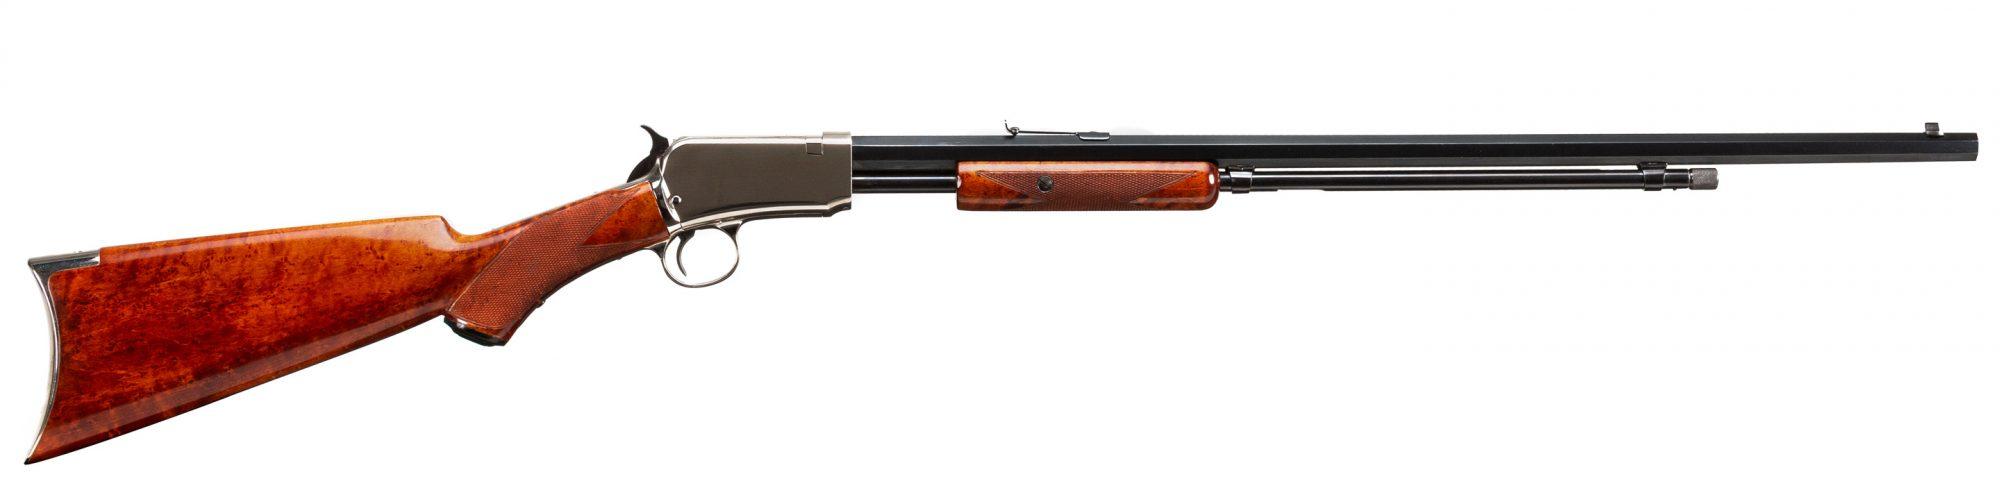 Winchester Model 1890